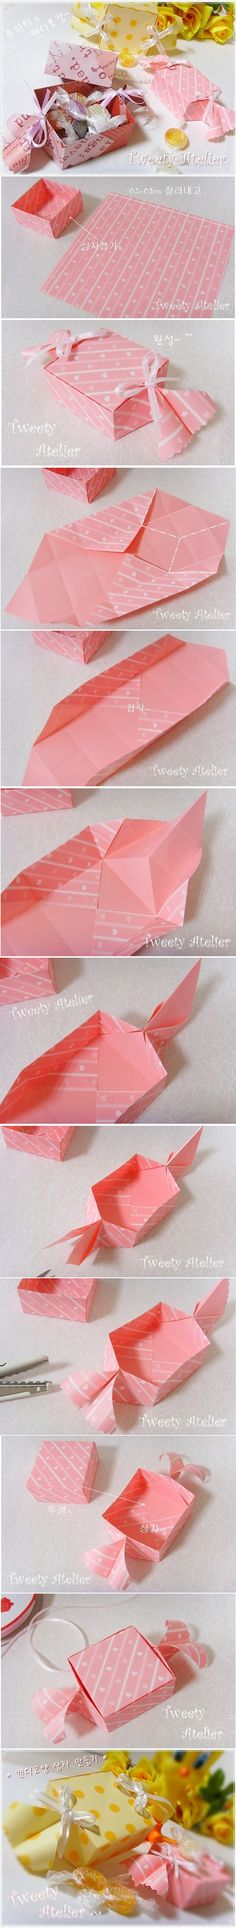 origami tutorial caixa de presente